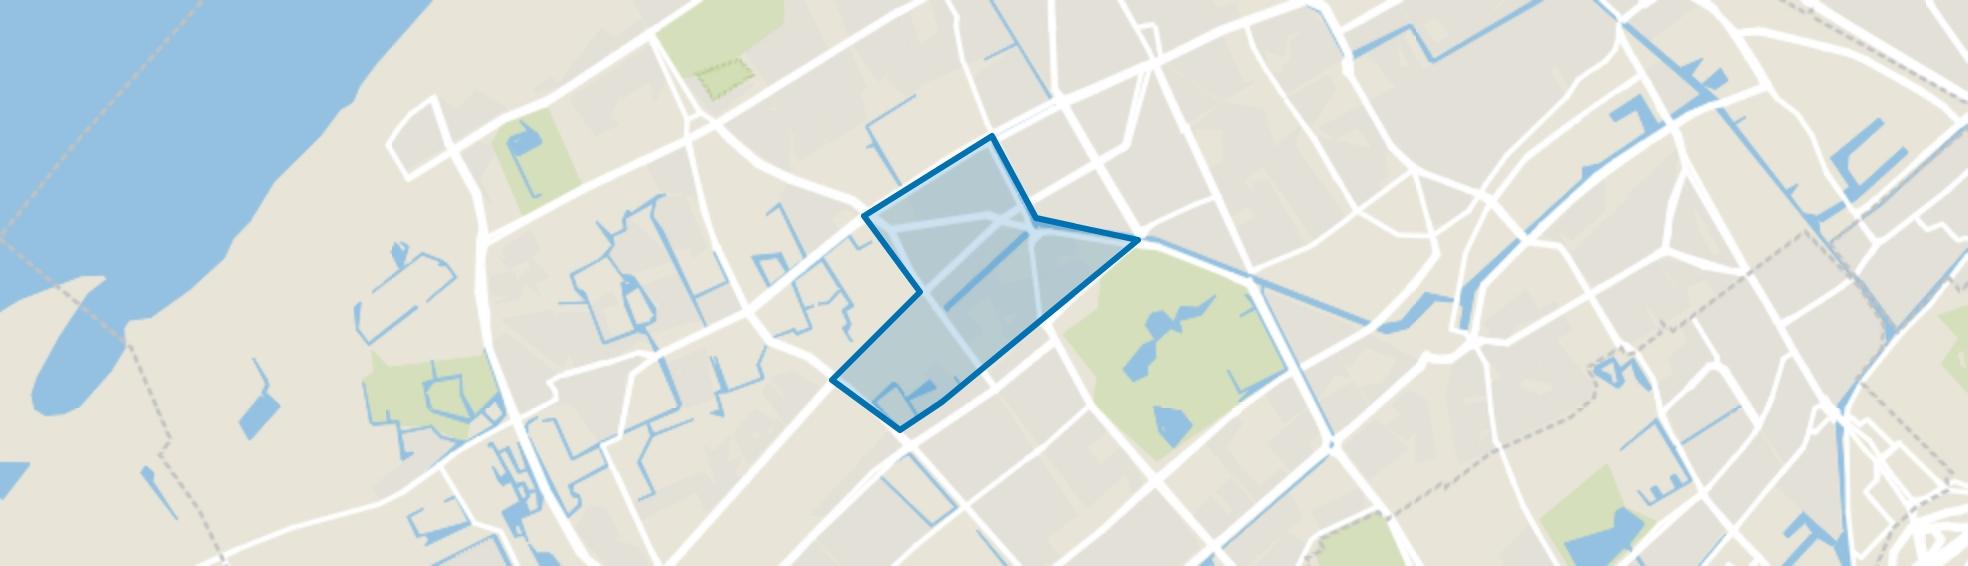 Leyenburg, Den Haag map